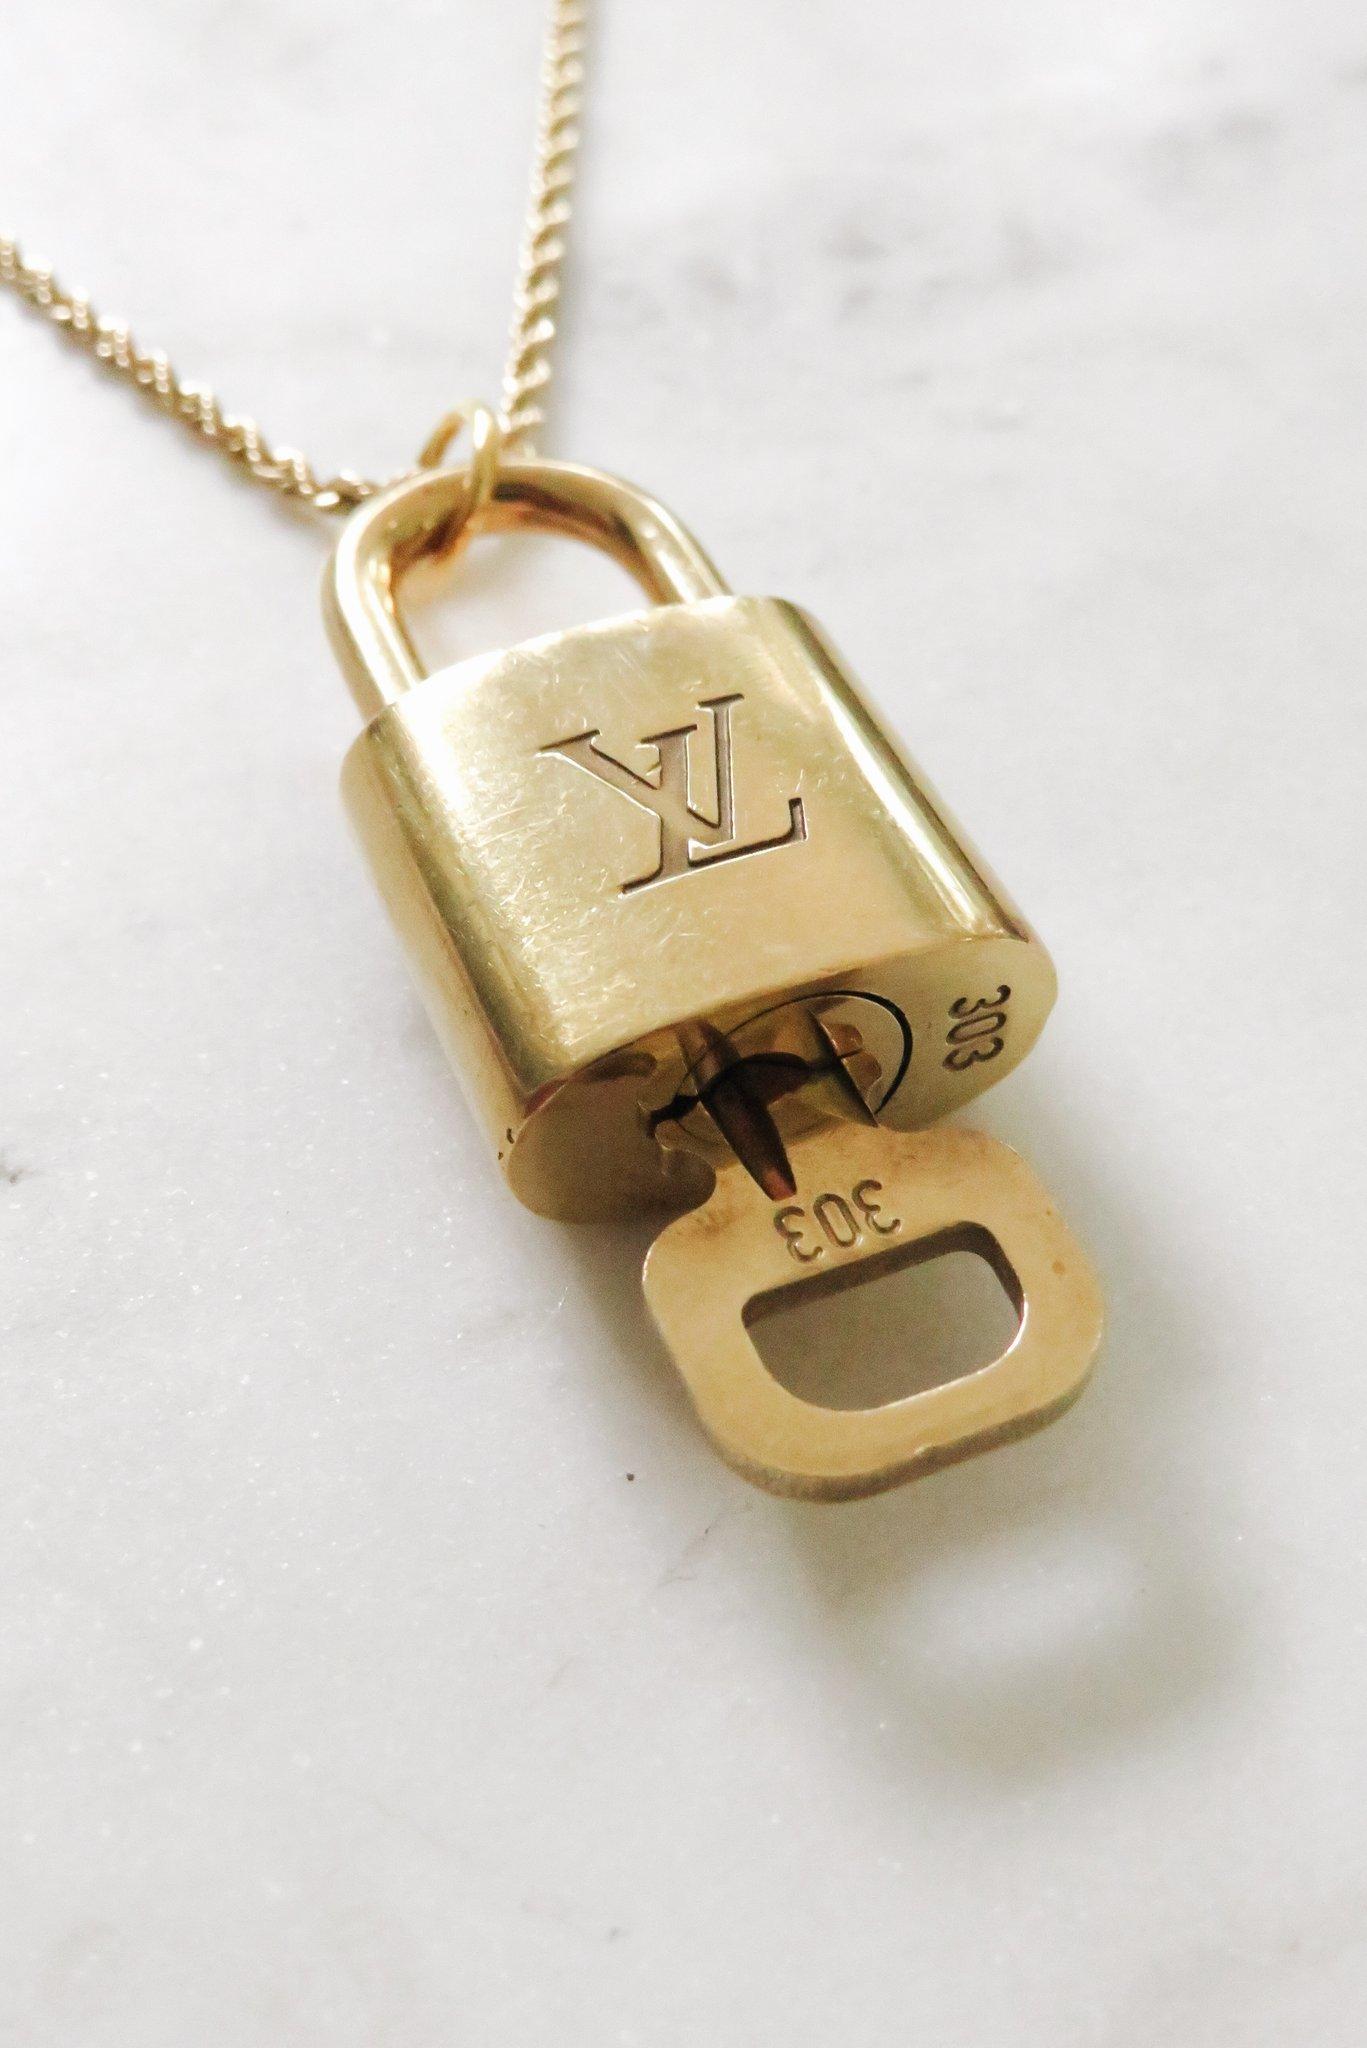 Louis Vuitton Lock Necklace.JPG